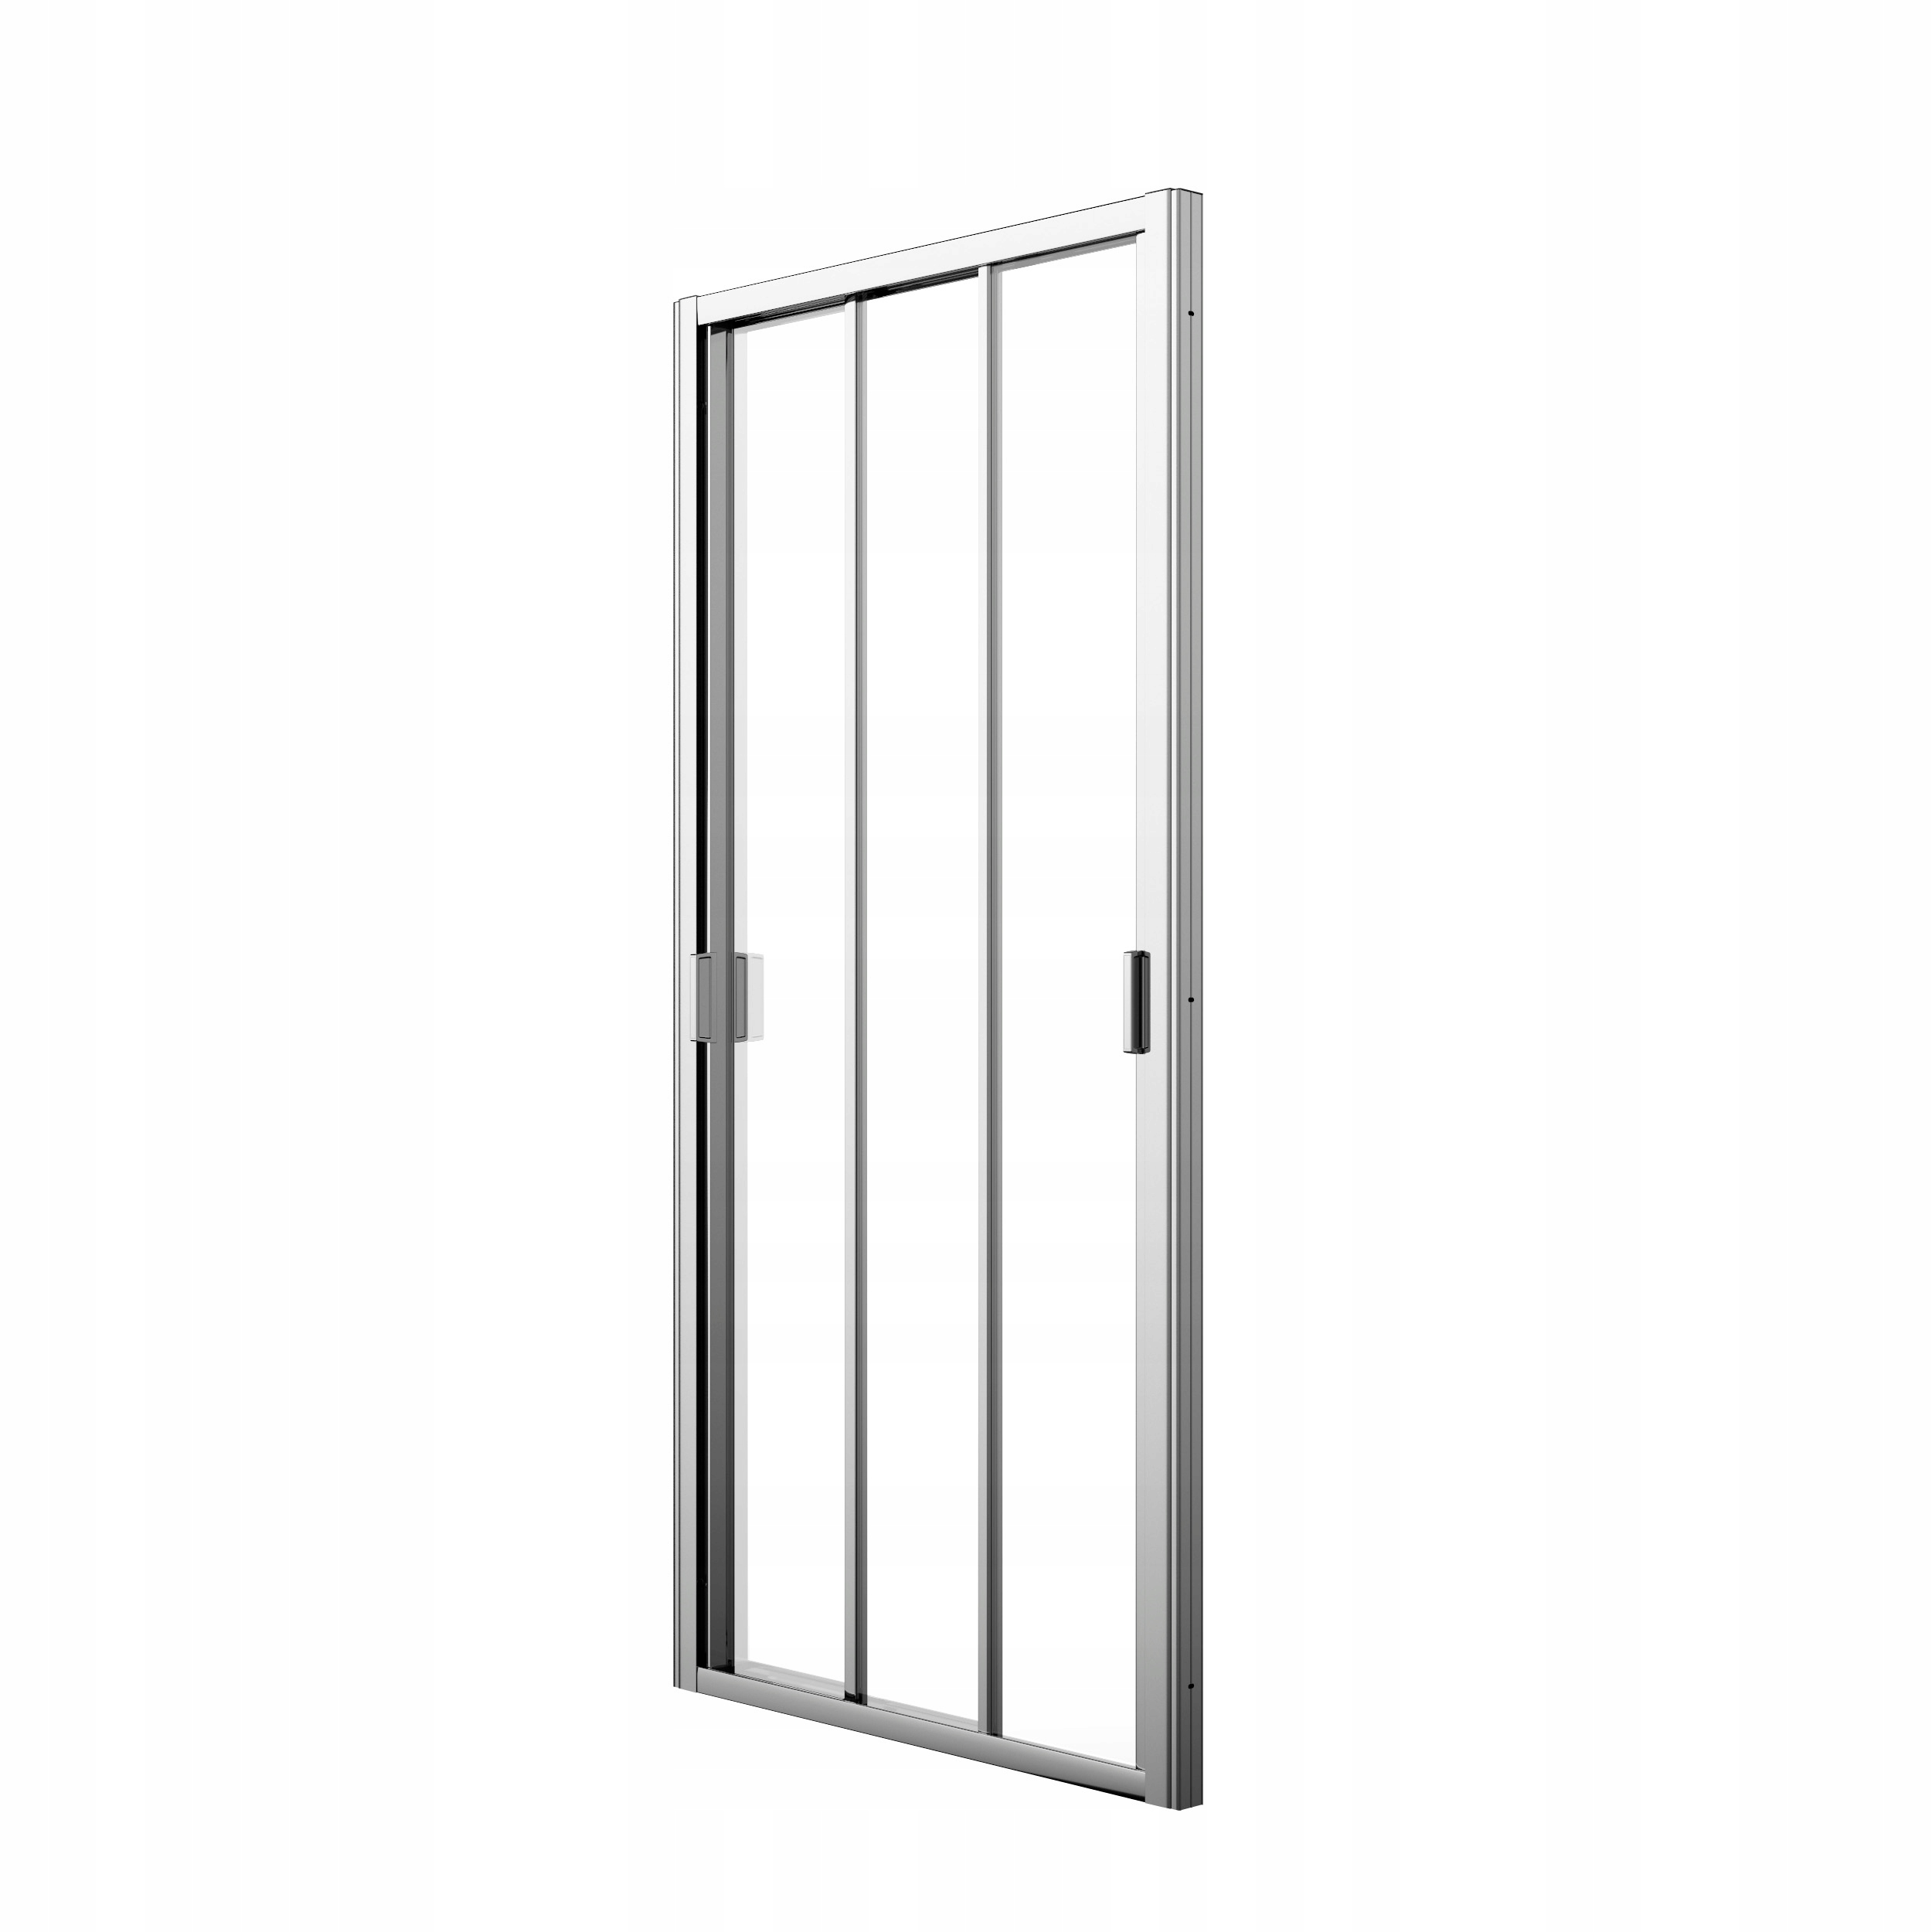 Sprchové dvere EVO DW 90x200 cm RADAWAY